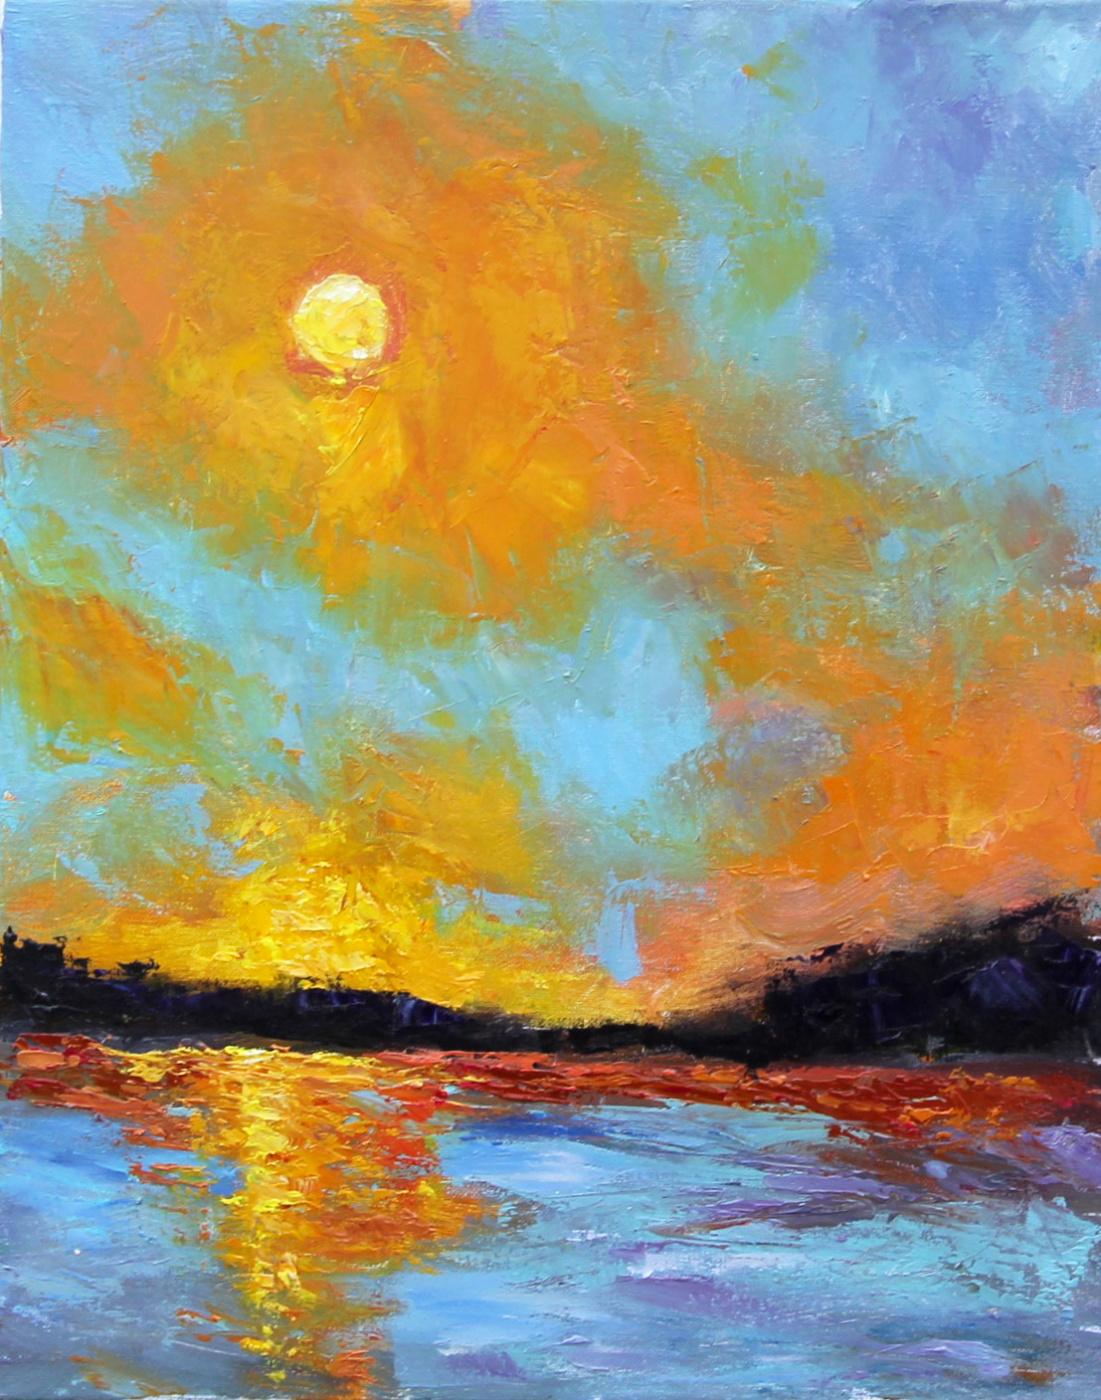 Андрей Горба. Sunset